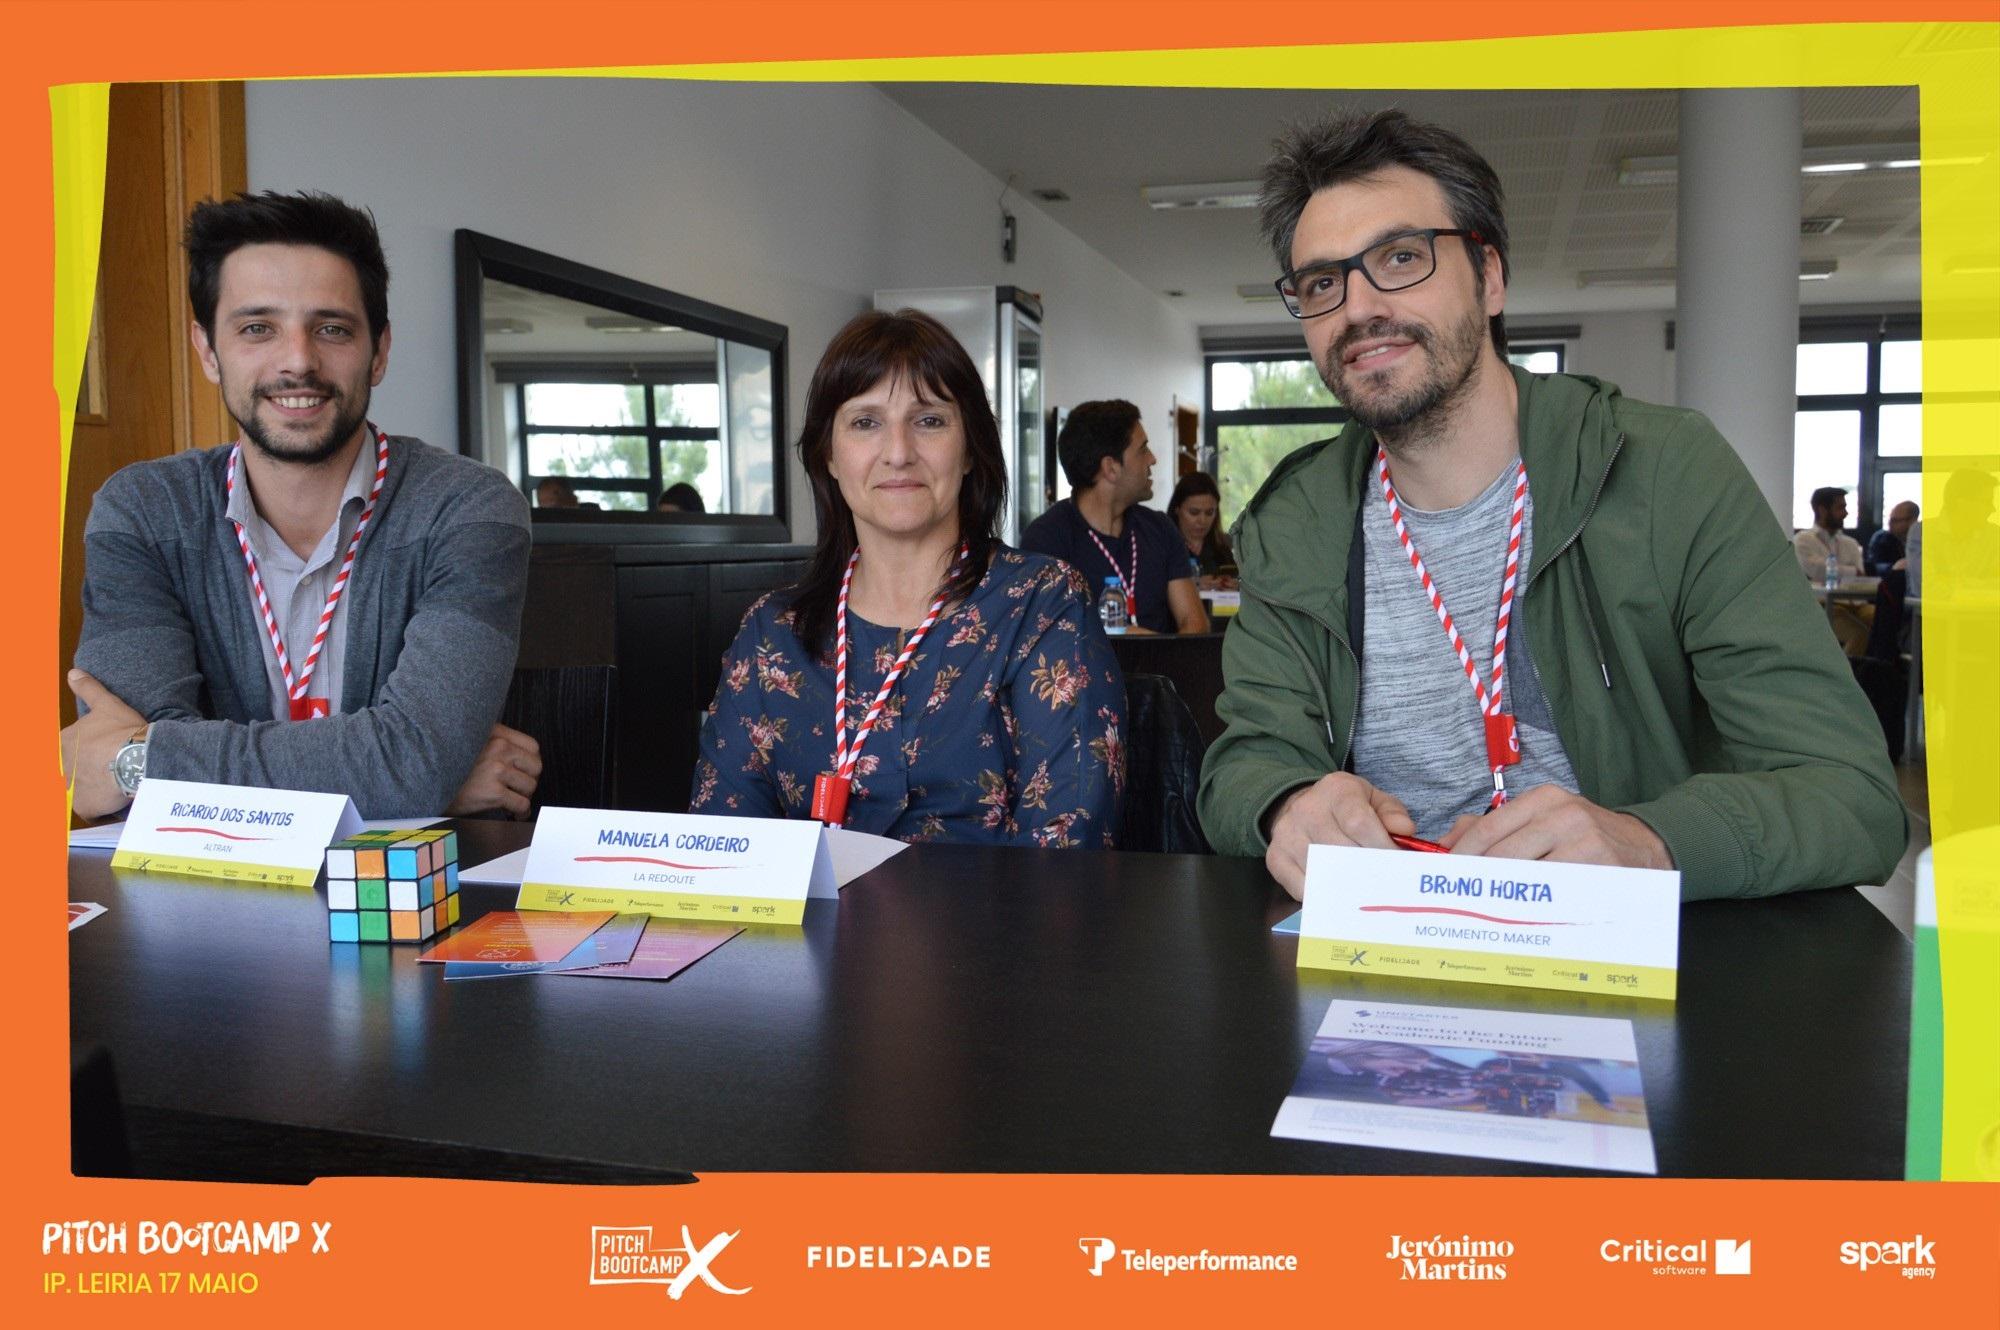 Spark Agency's Pitch Bootcamp @ Instituto Politécnico de Leiria